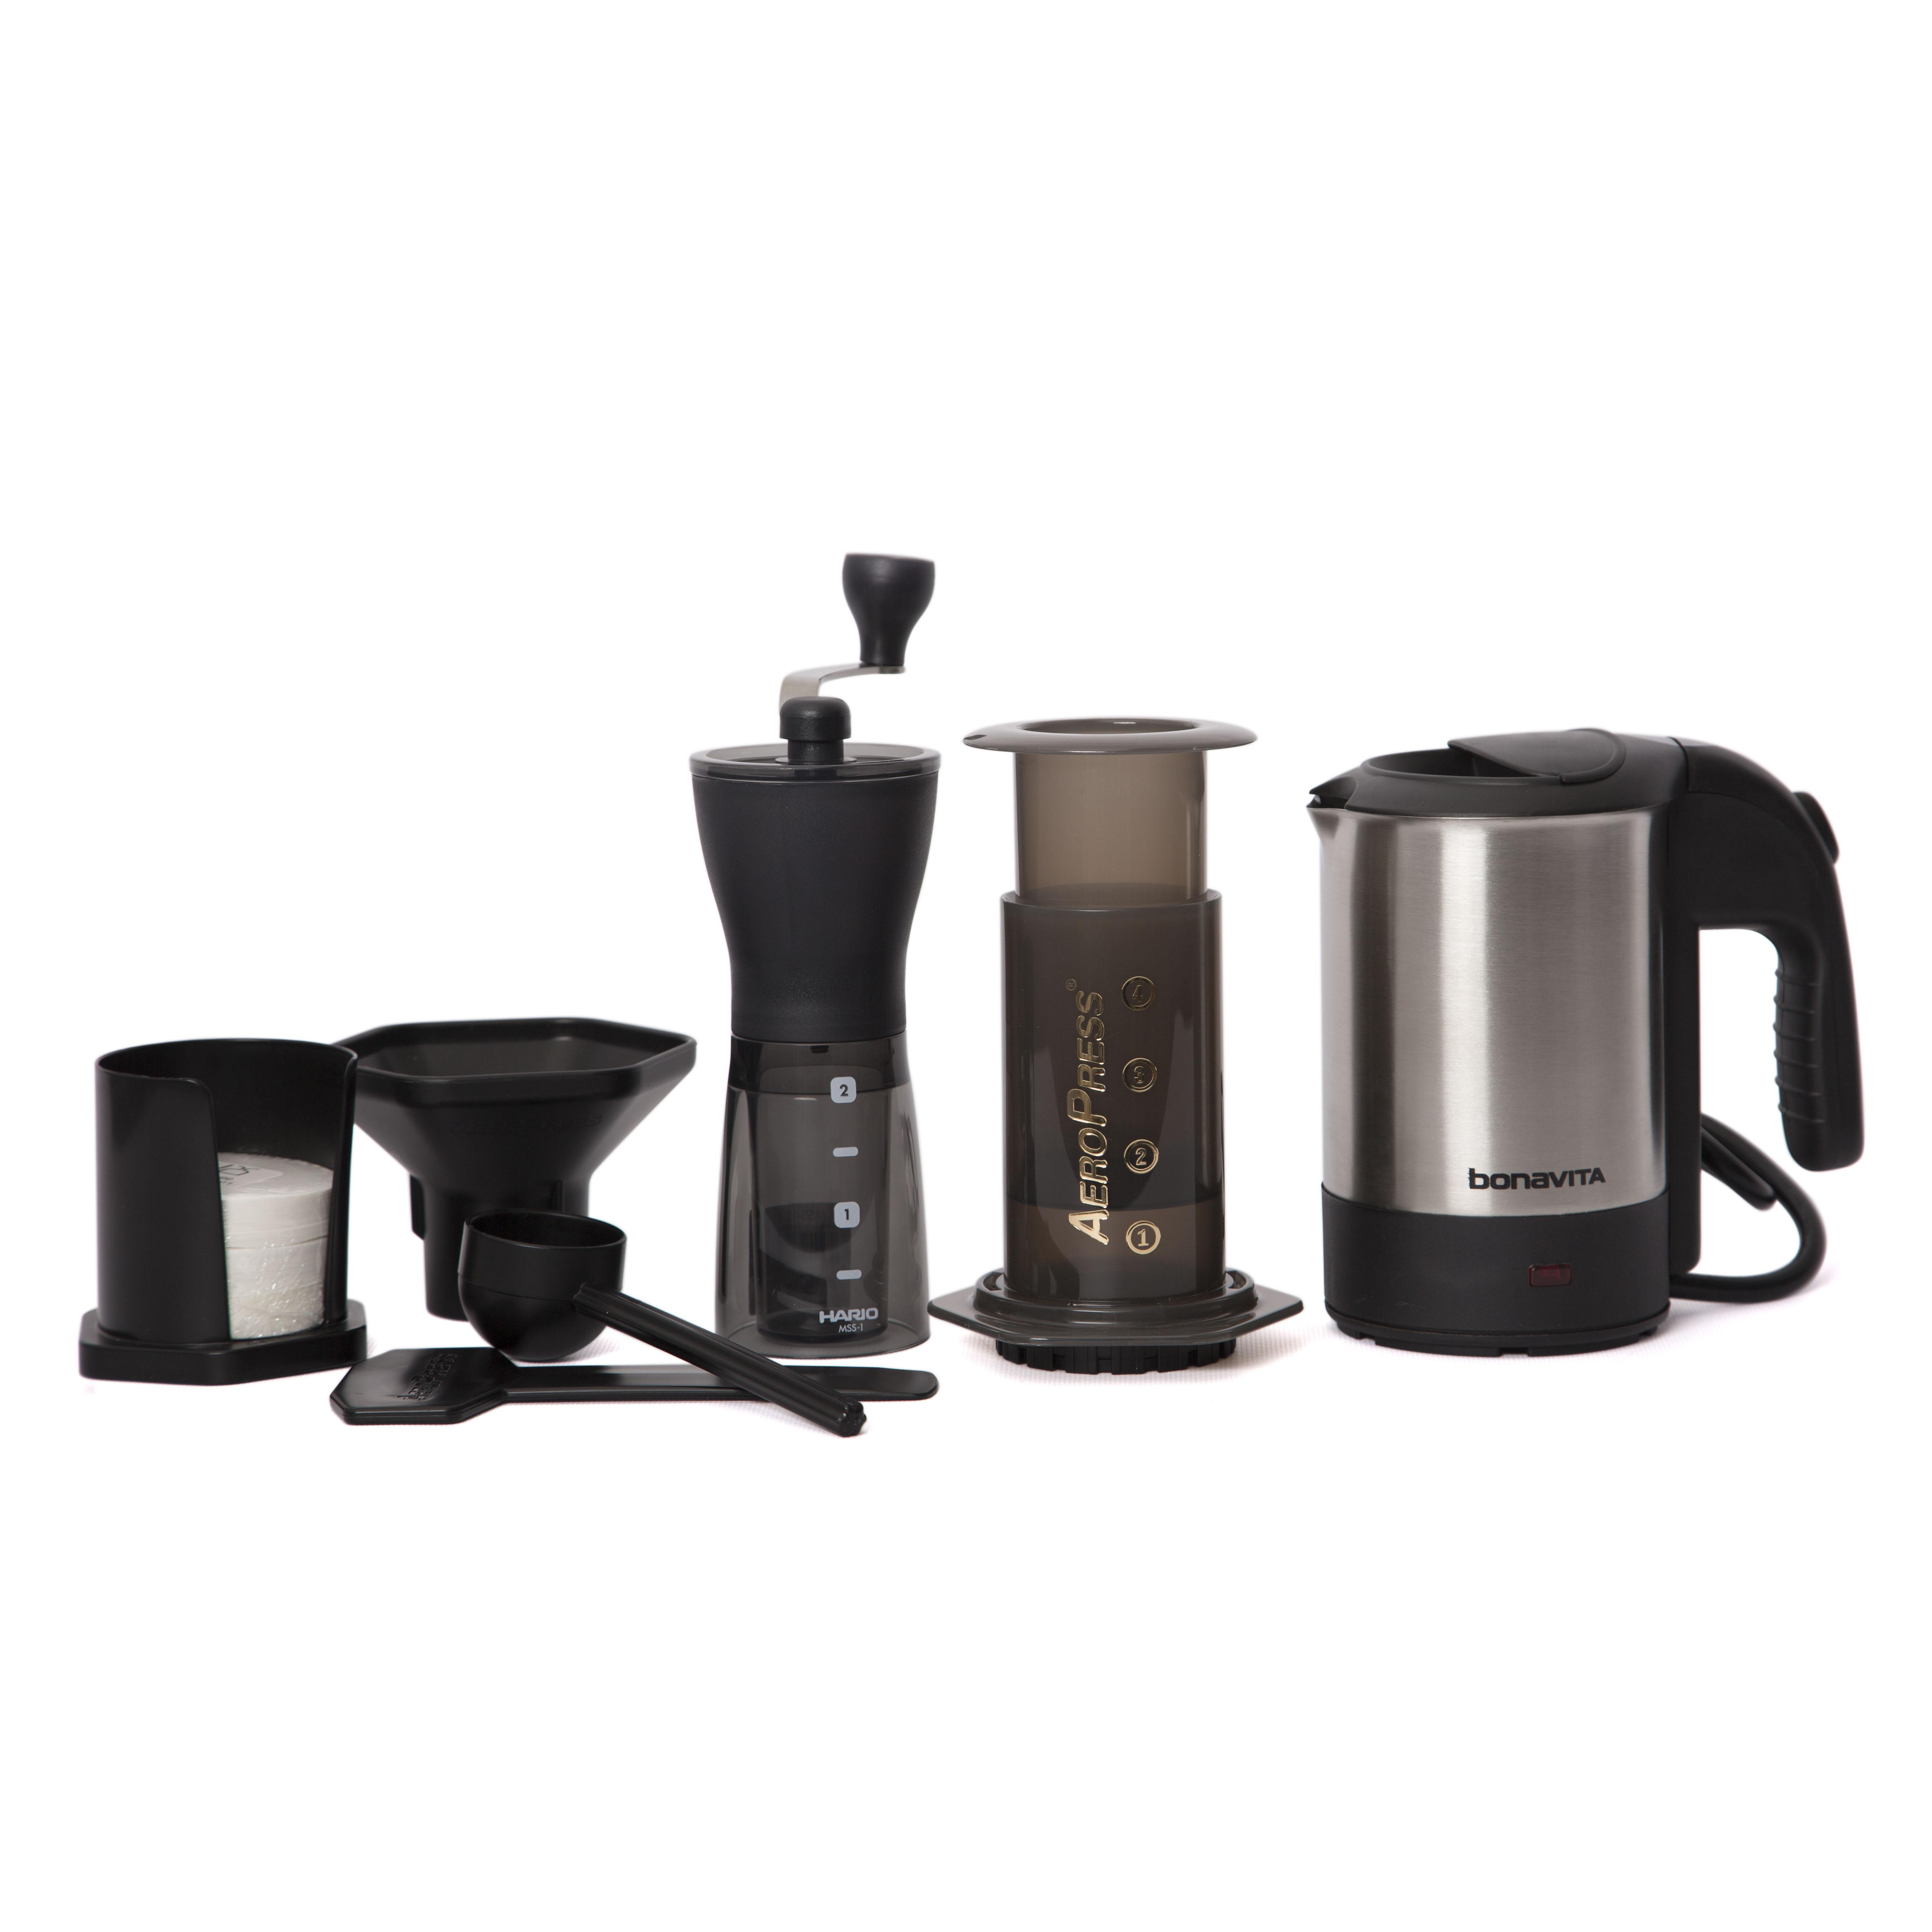 Prima Coffee Coffee Travel Kit